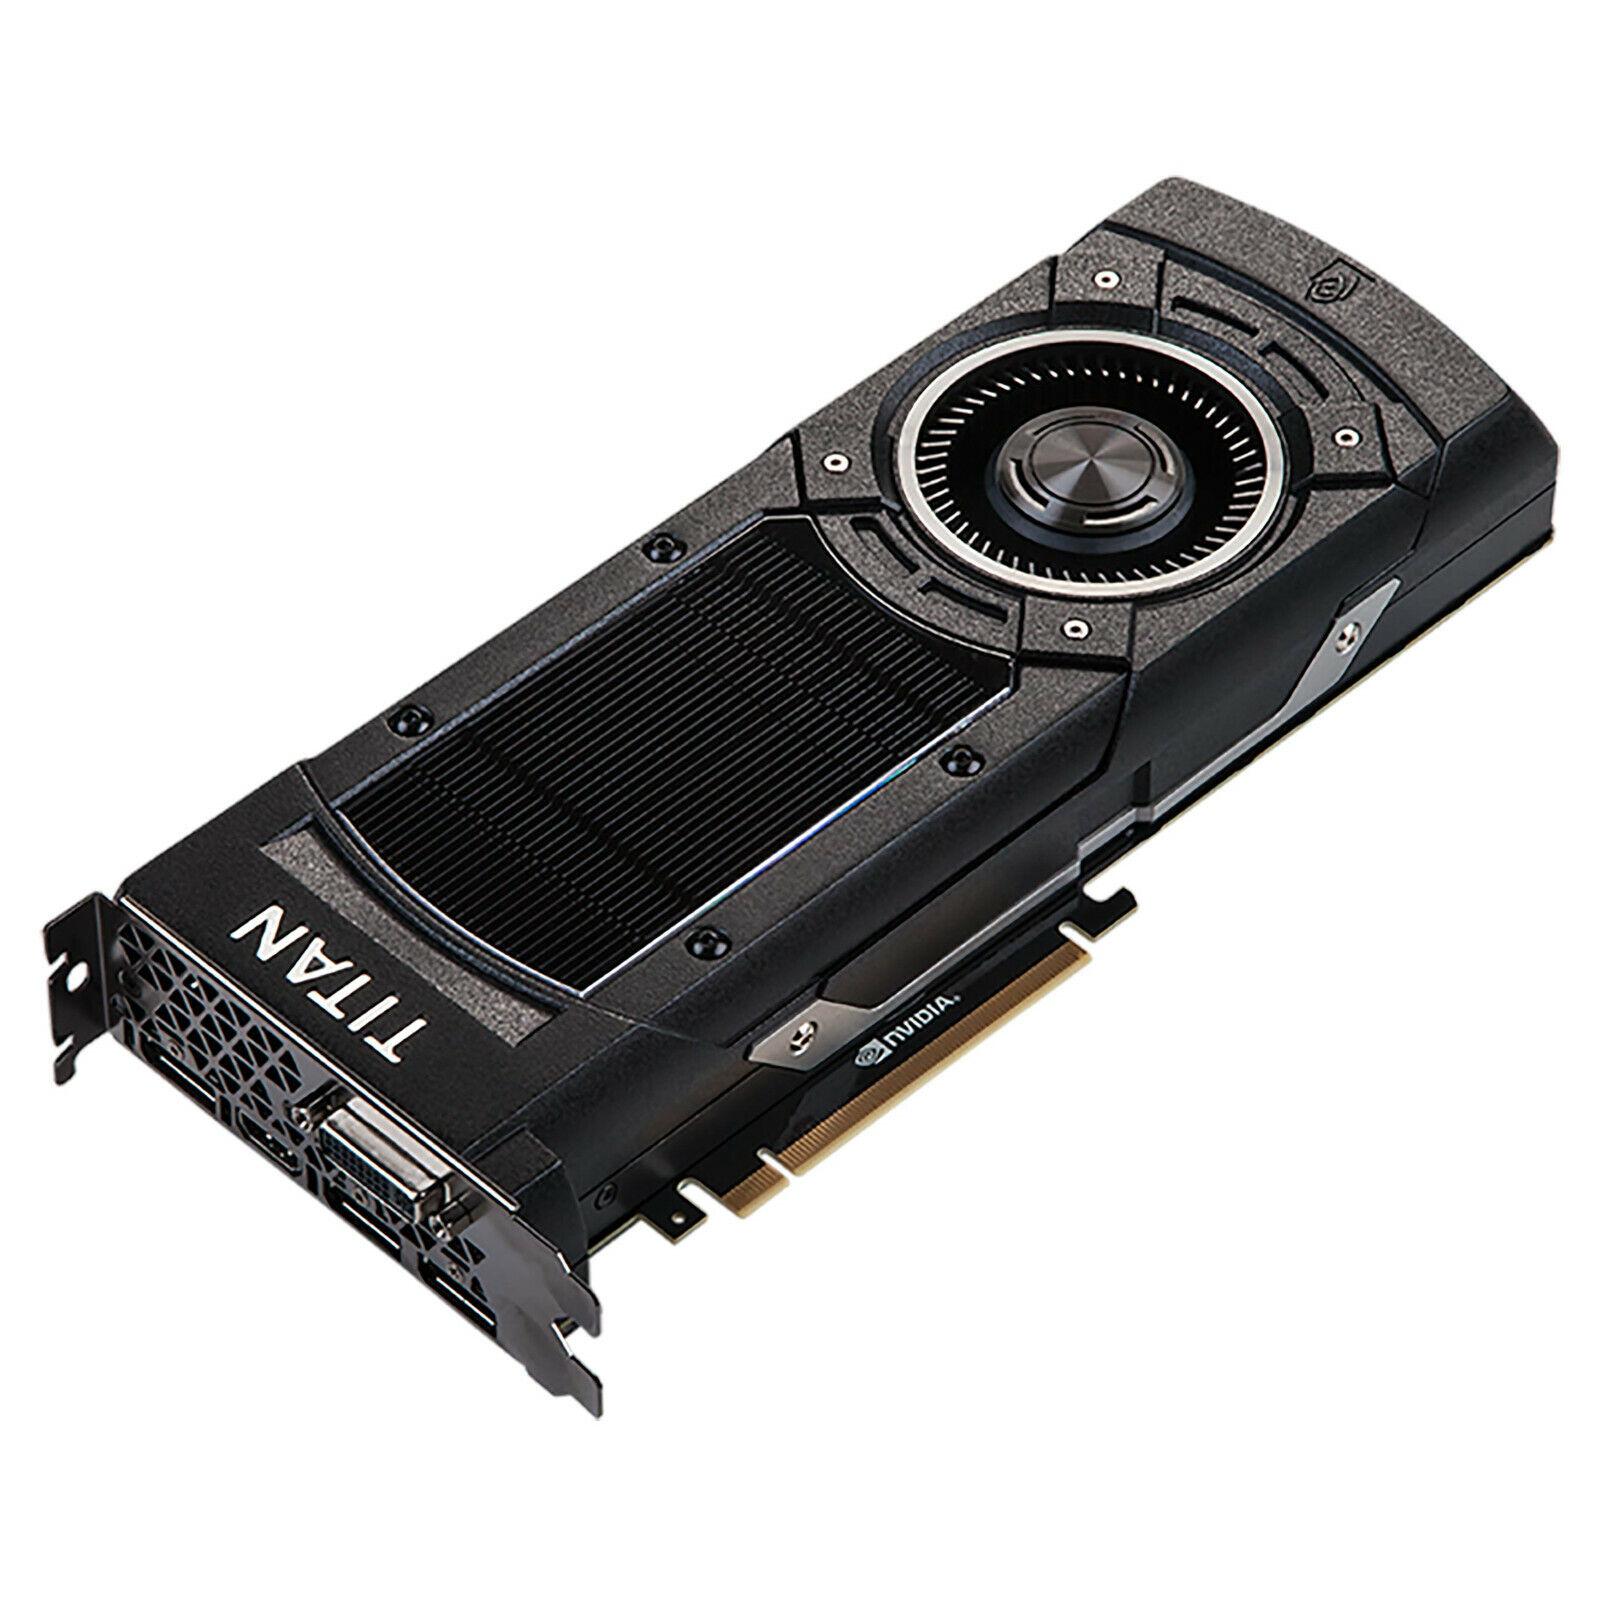 NVIDIA GeForce GTX Titan X Maxwell High-End Profi Extreme Grafikkarte 12GB GDDR5